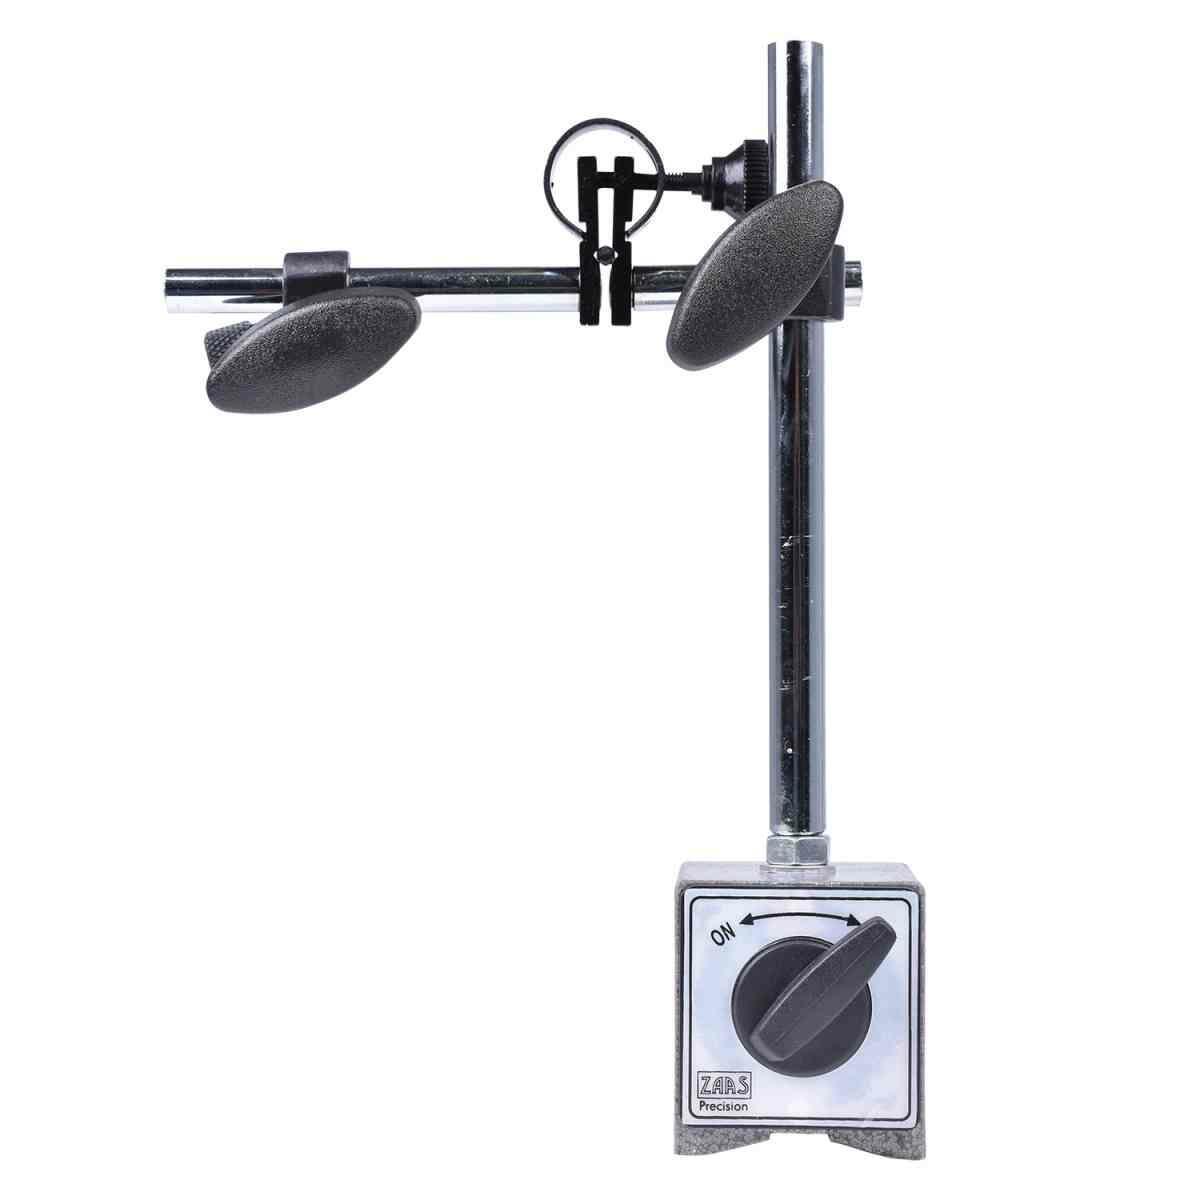 Base Magnética Para Relógio Comparador E Apalpador 04,0001 Zaas